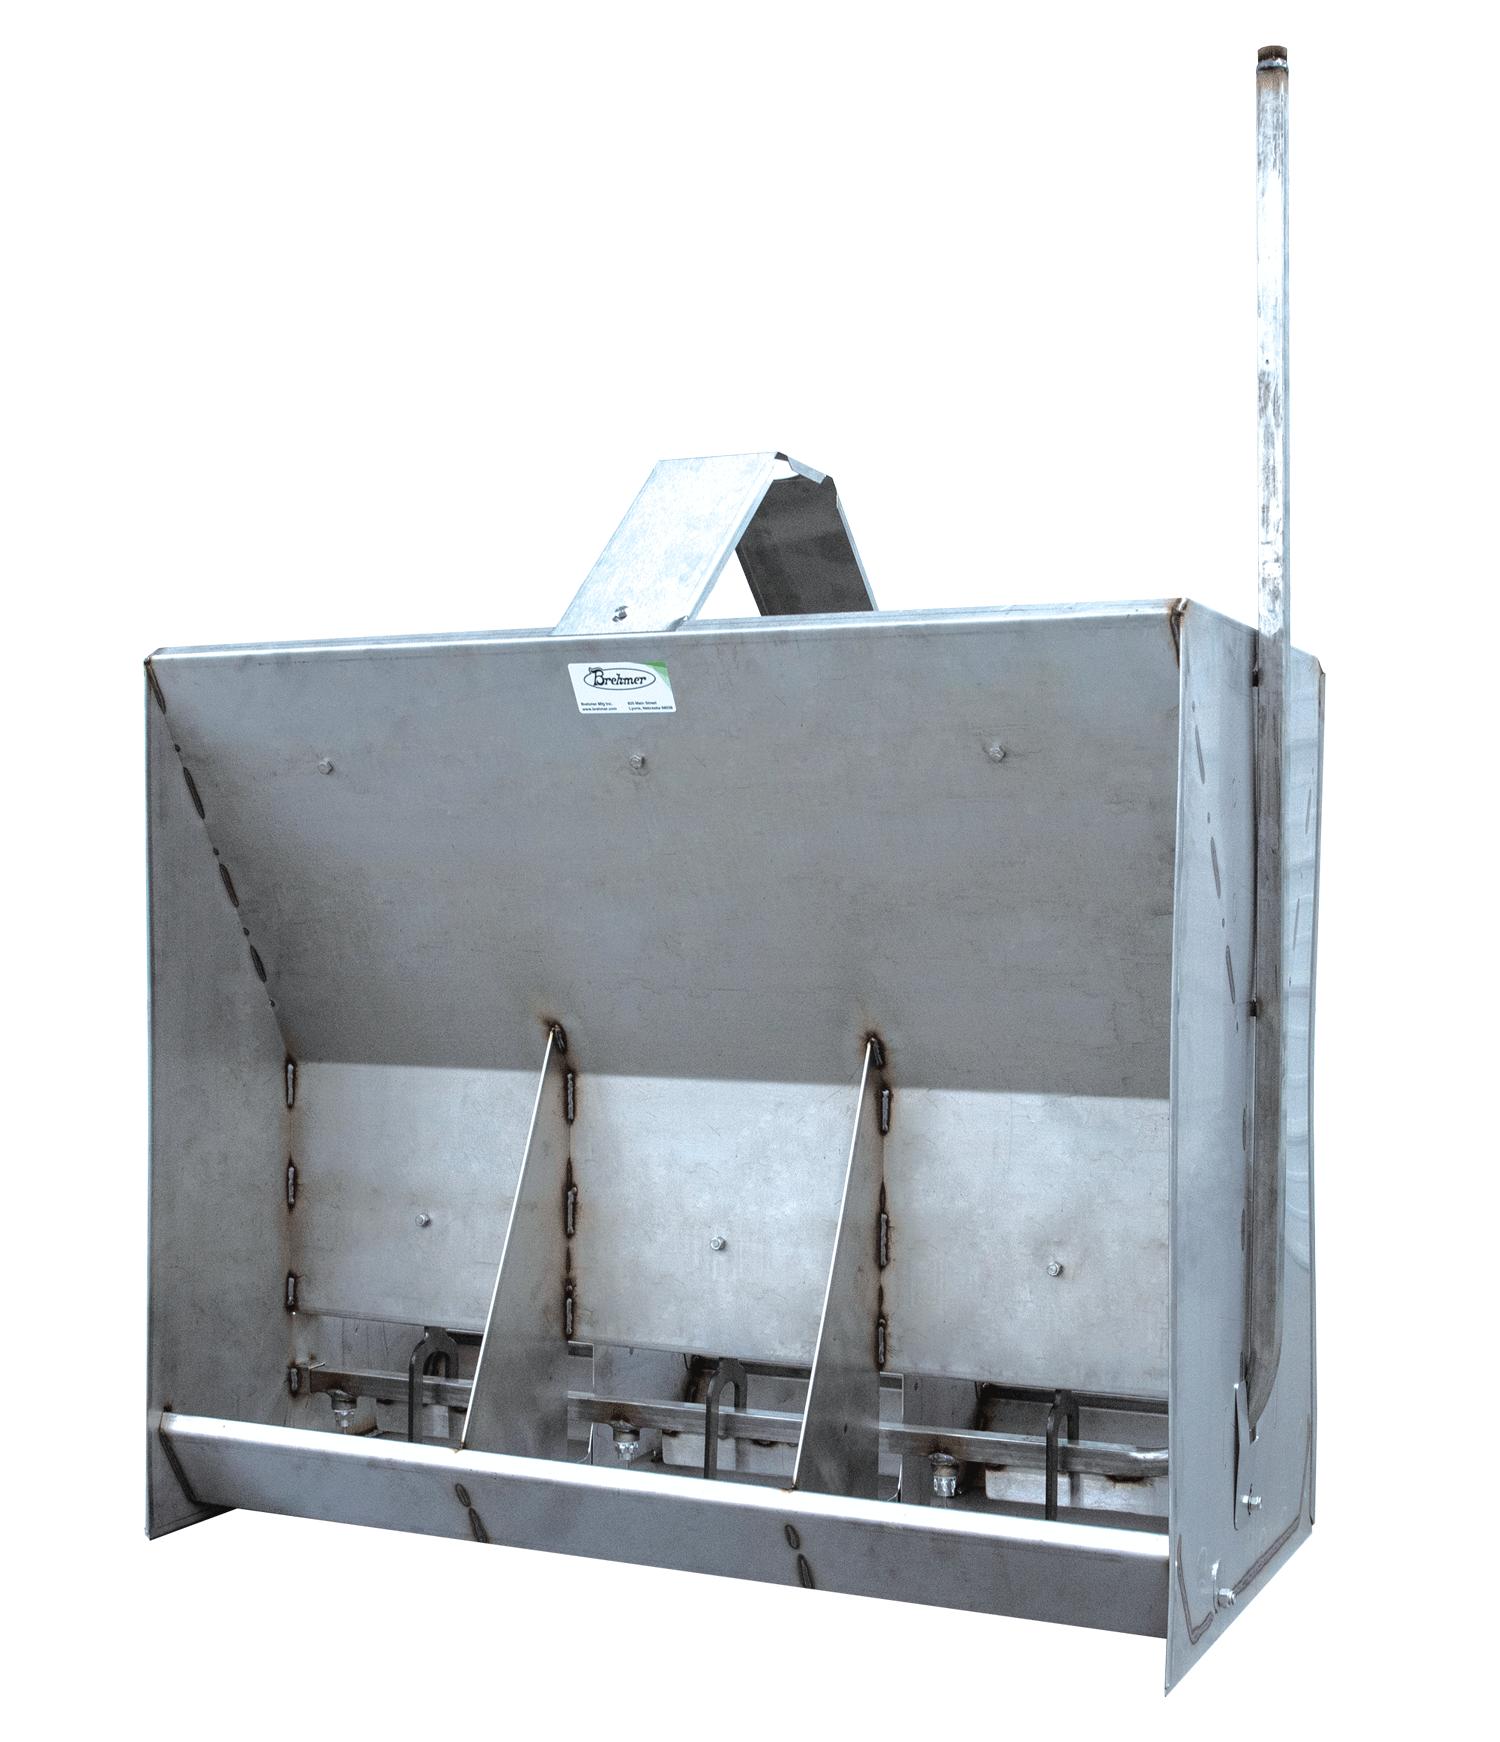 Brehmer Paddle Feeder - stainless steel hog feeder